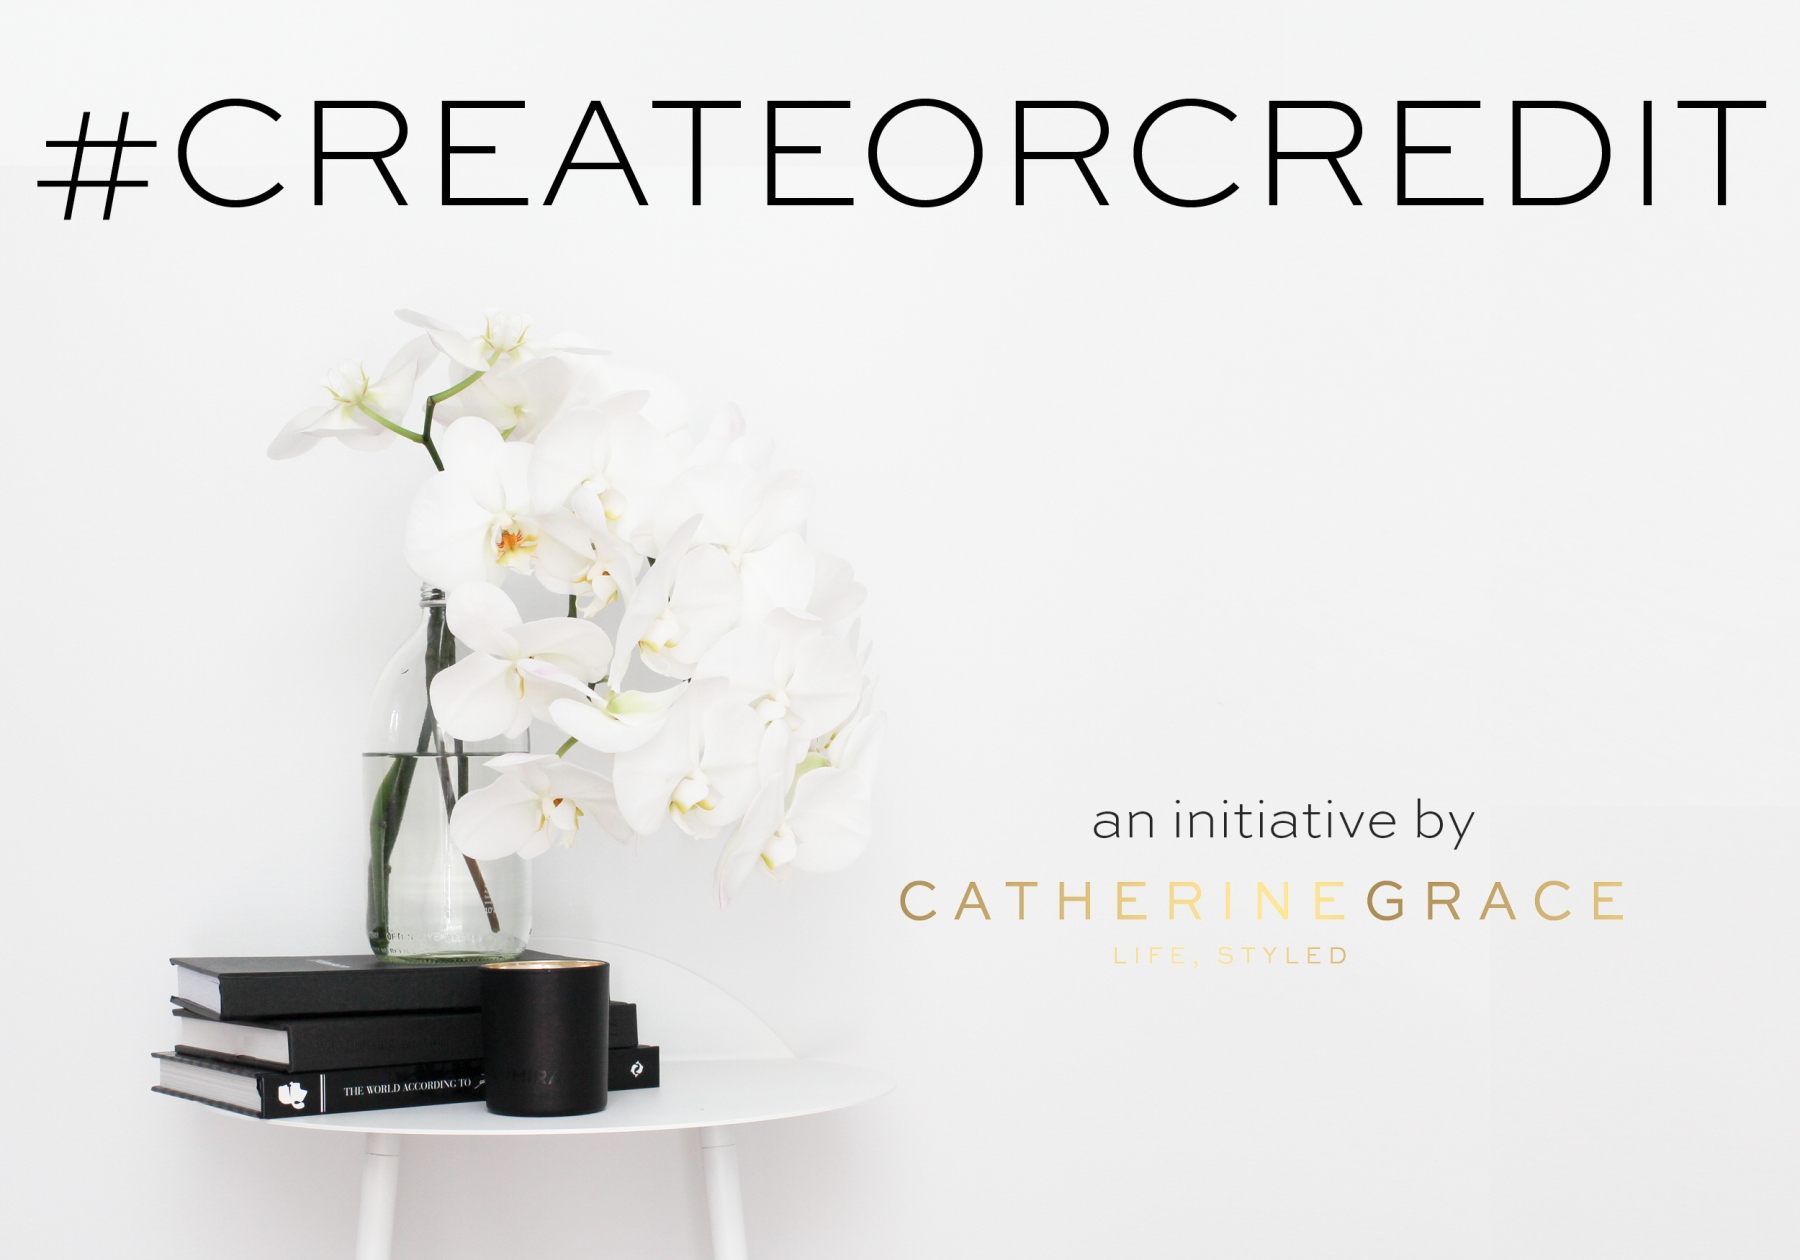 #createorcredit | Image by CATHERINEGRACE | www.catherinegrace.com.au